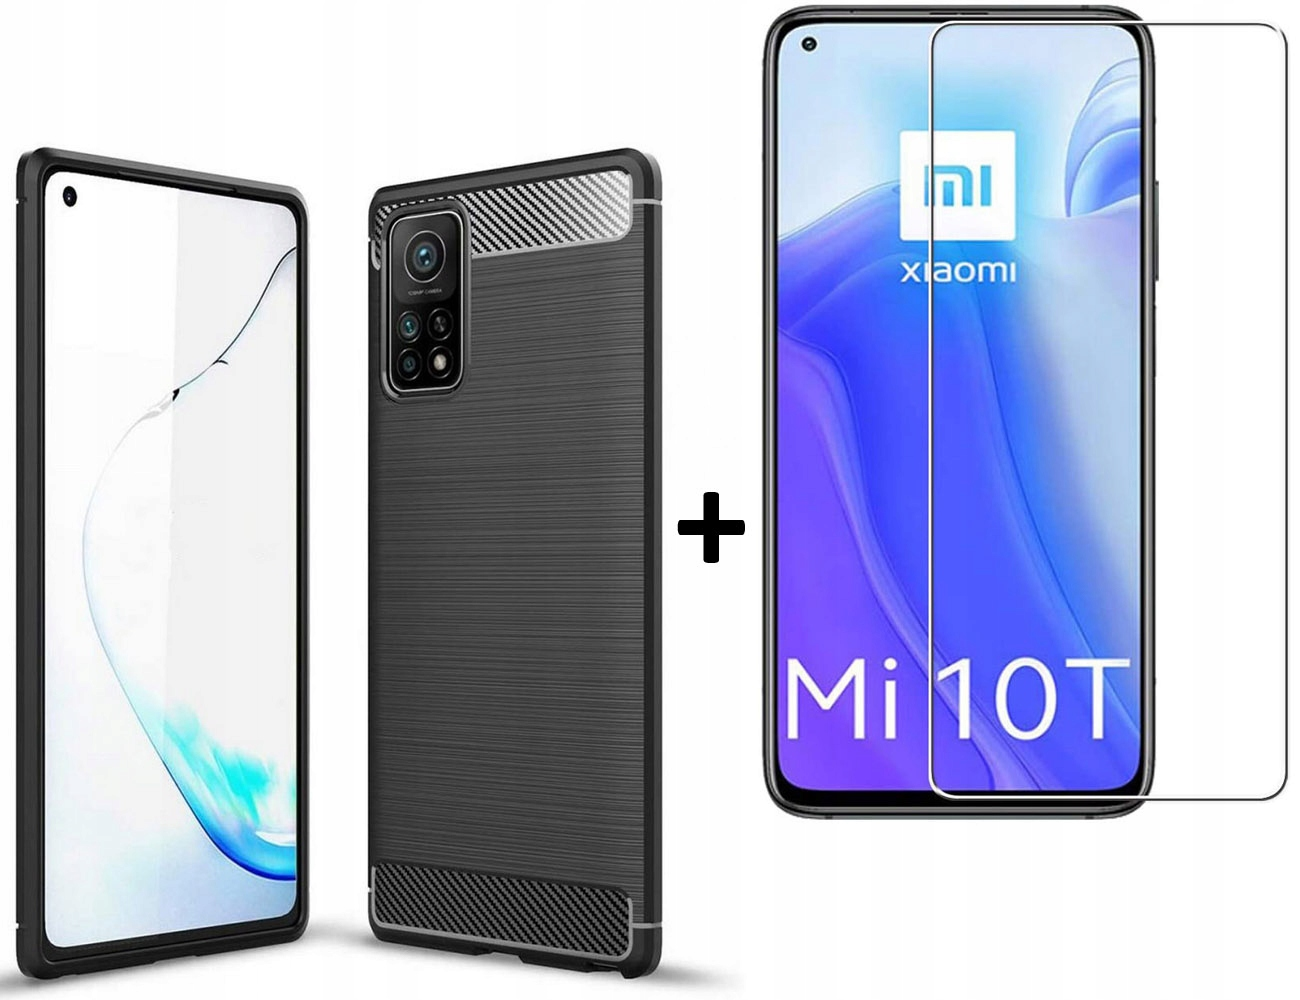 Etui Tpucarbon + szkło do Xiaomi Mi 10T / 10T Pro